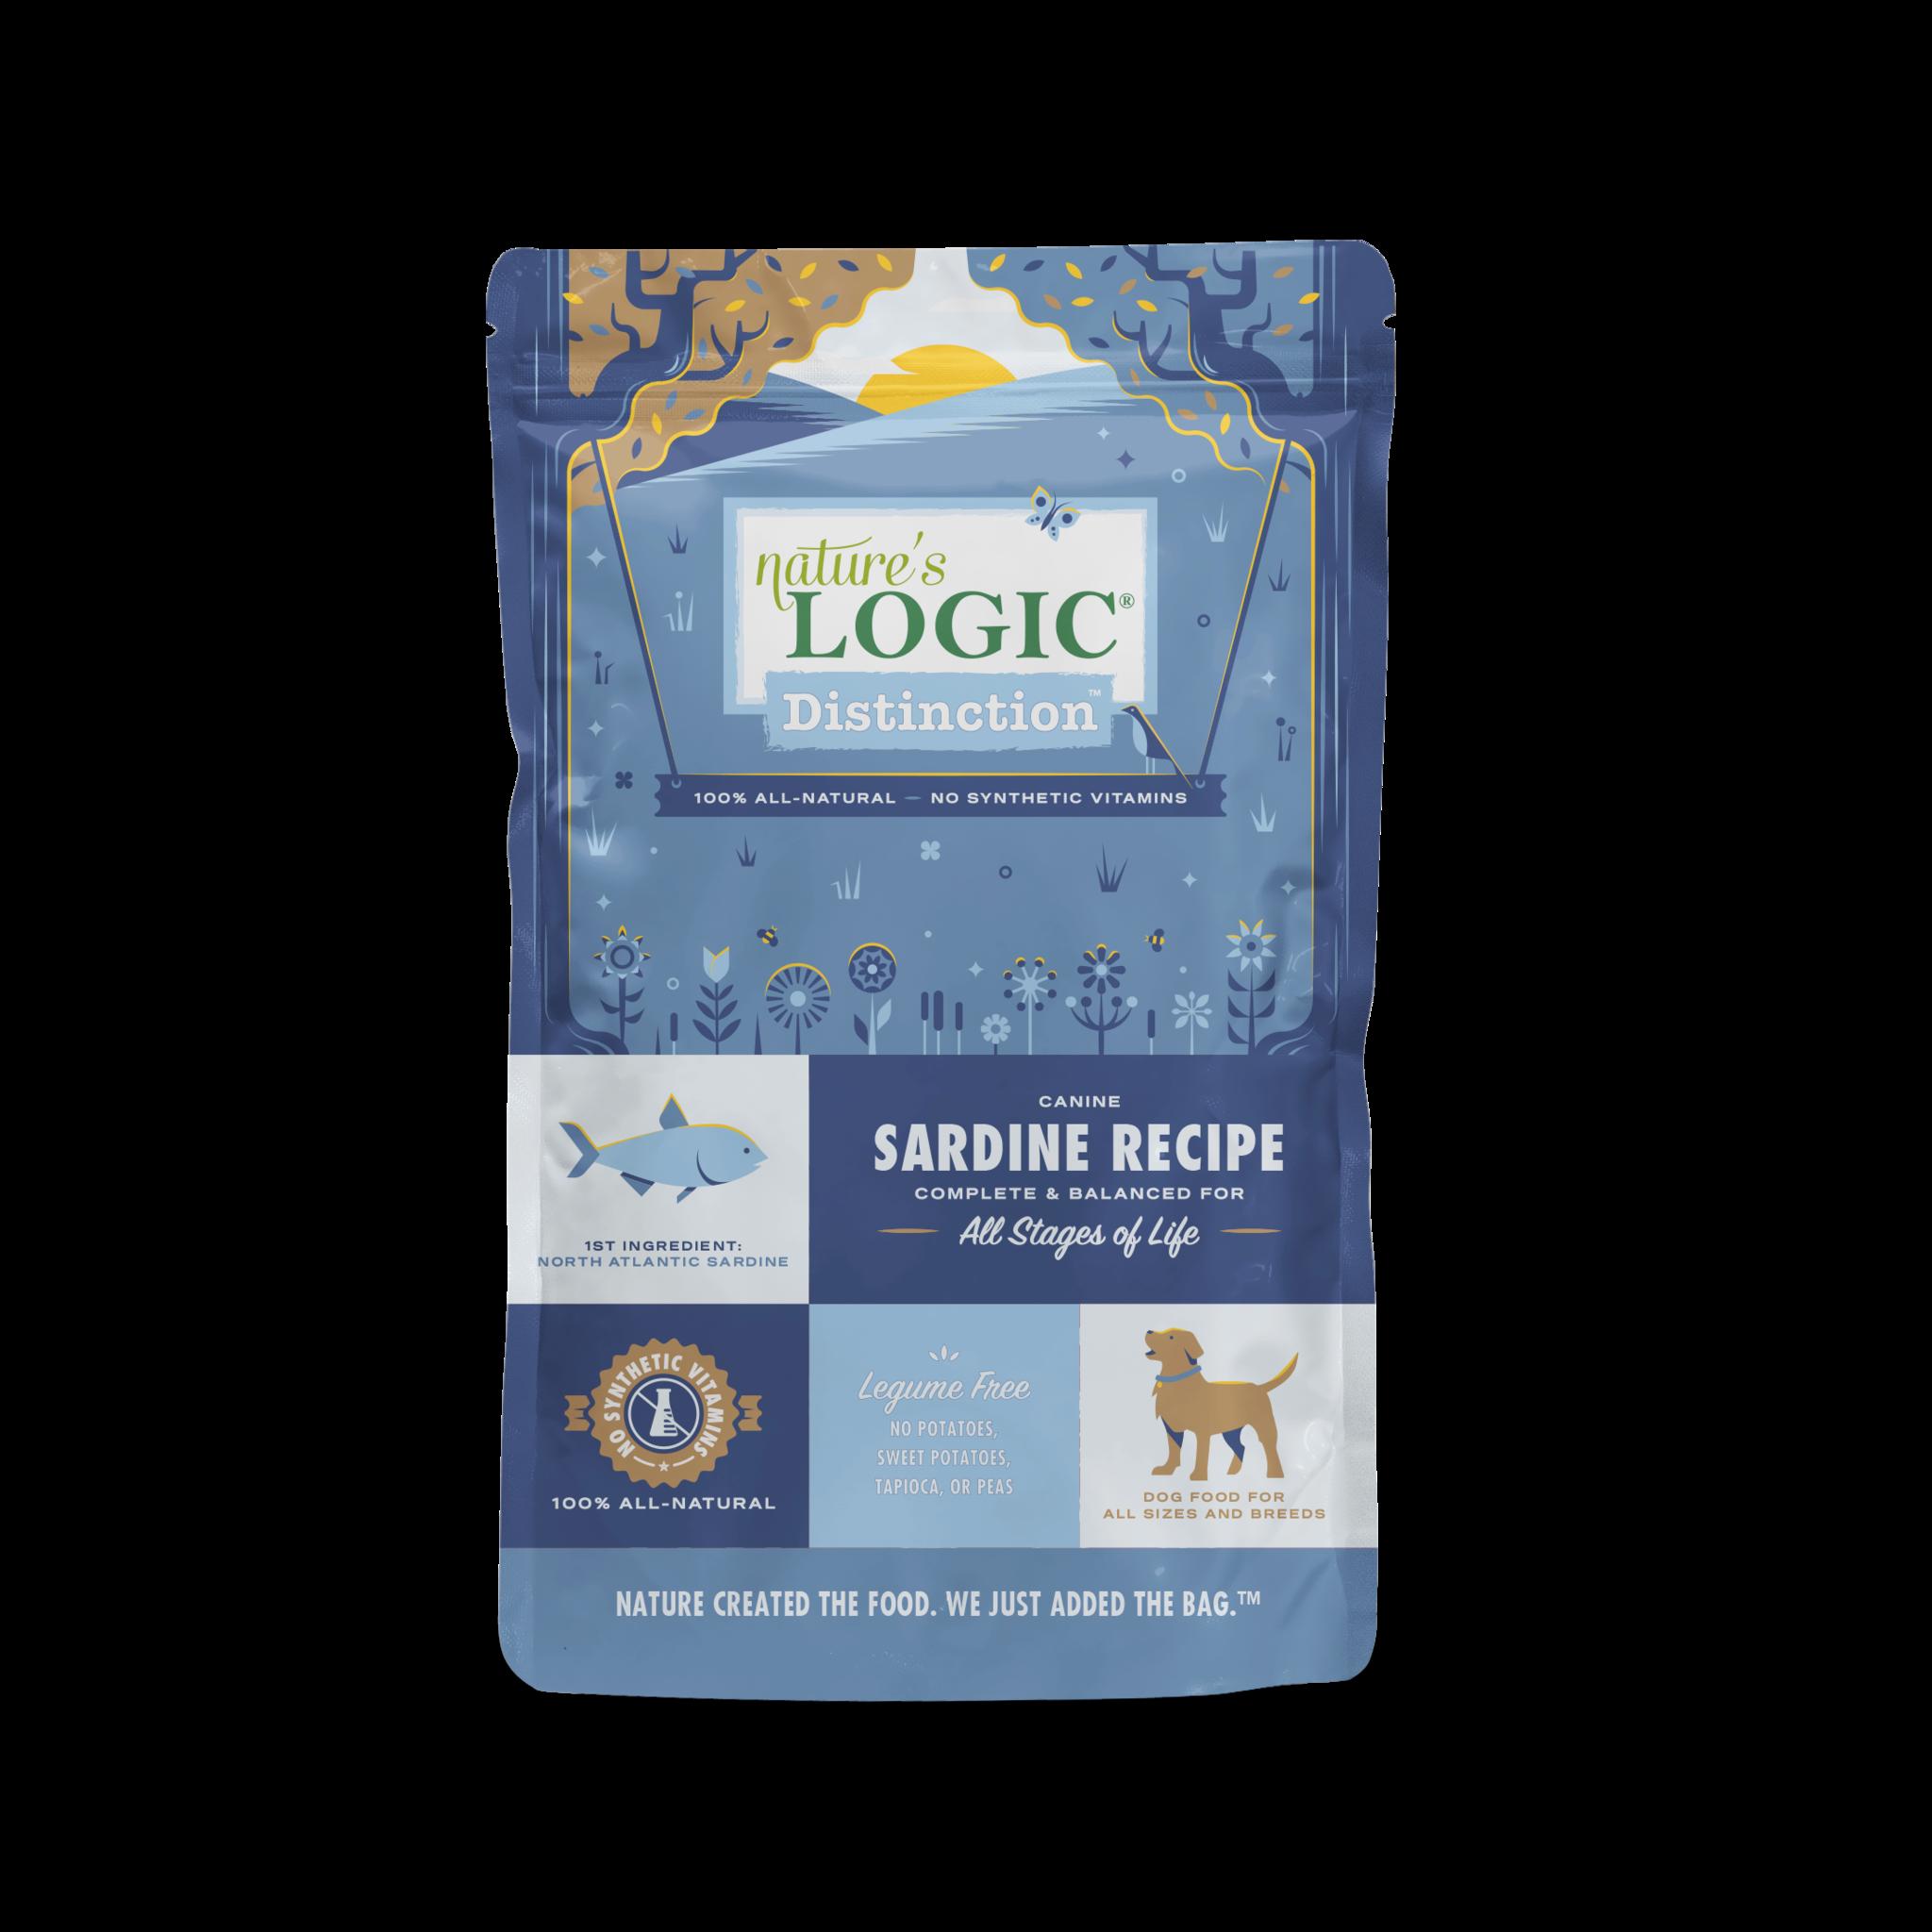 Nature's Logic Nature's Logic Distinction Sardine Dry Dog Food